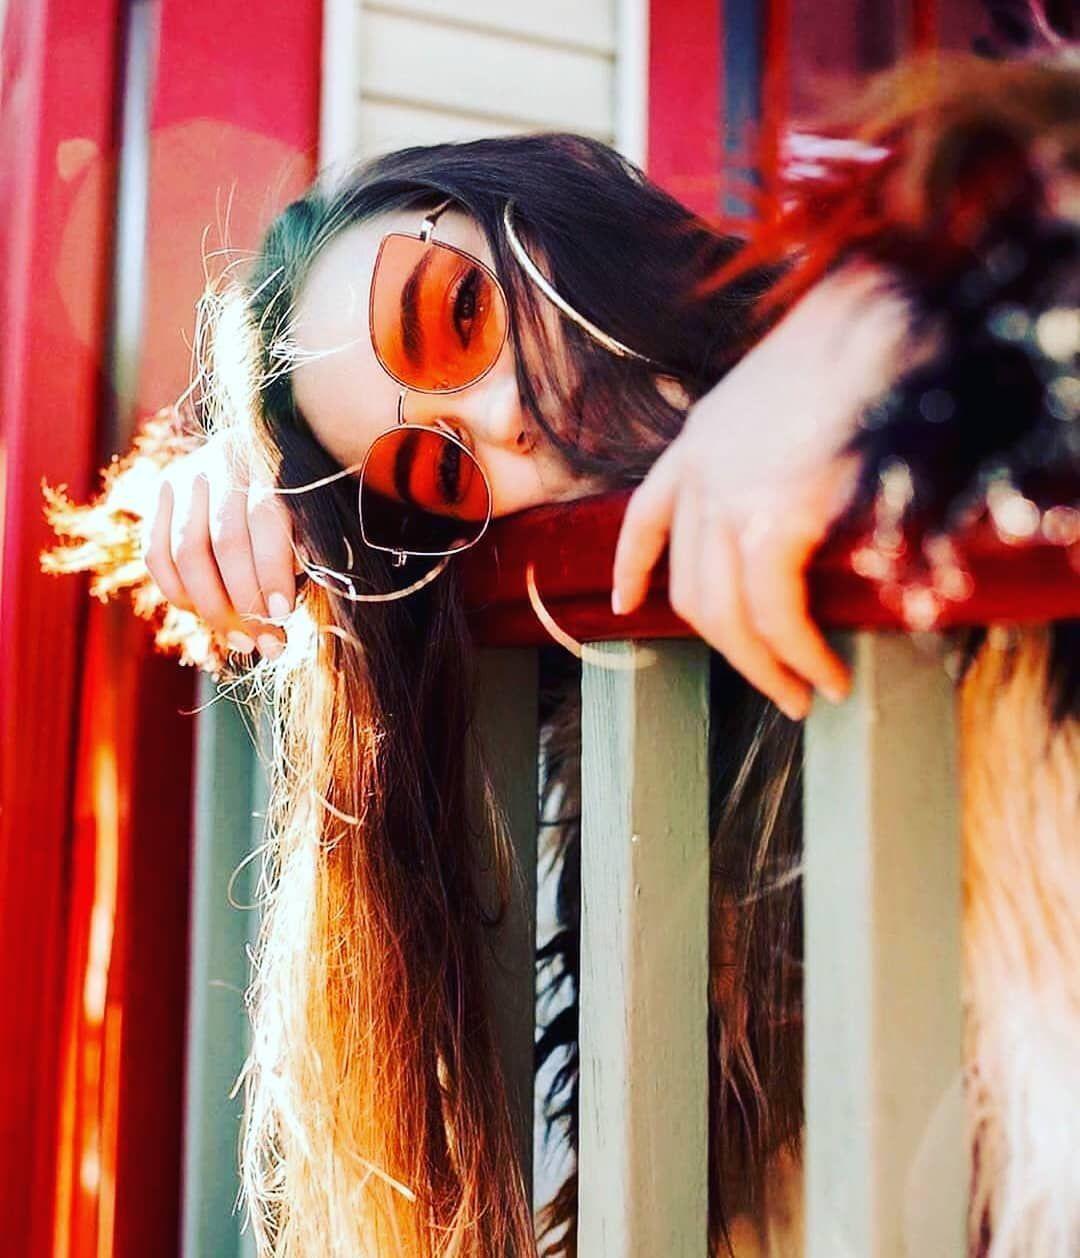 #angelinajolie#filmphotography#portraitphotography#dop#portfolio#portrait#filmmaking#dxb#amman#jordan#wome... #ammanjordan #angelinajolie#filmphotography#portraitphotography#dop#portfolio#portrait#filmmaking#dxb#amman#jordan#wome... #ammanjordan #angelinajolie#filmphotography#portraitphotography#dop#portfolio#portrait#filmmaking#dxb#amman#jordan#wome... #ammanjordan #angelinajolie#filmphotography#portraitphotography#dop#portfolio#portrait#filmmaking#dxb#amman#jordan#wome... #ammanjordan #angelin #ammanjordan